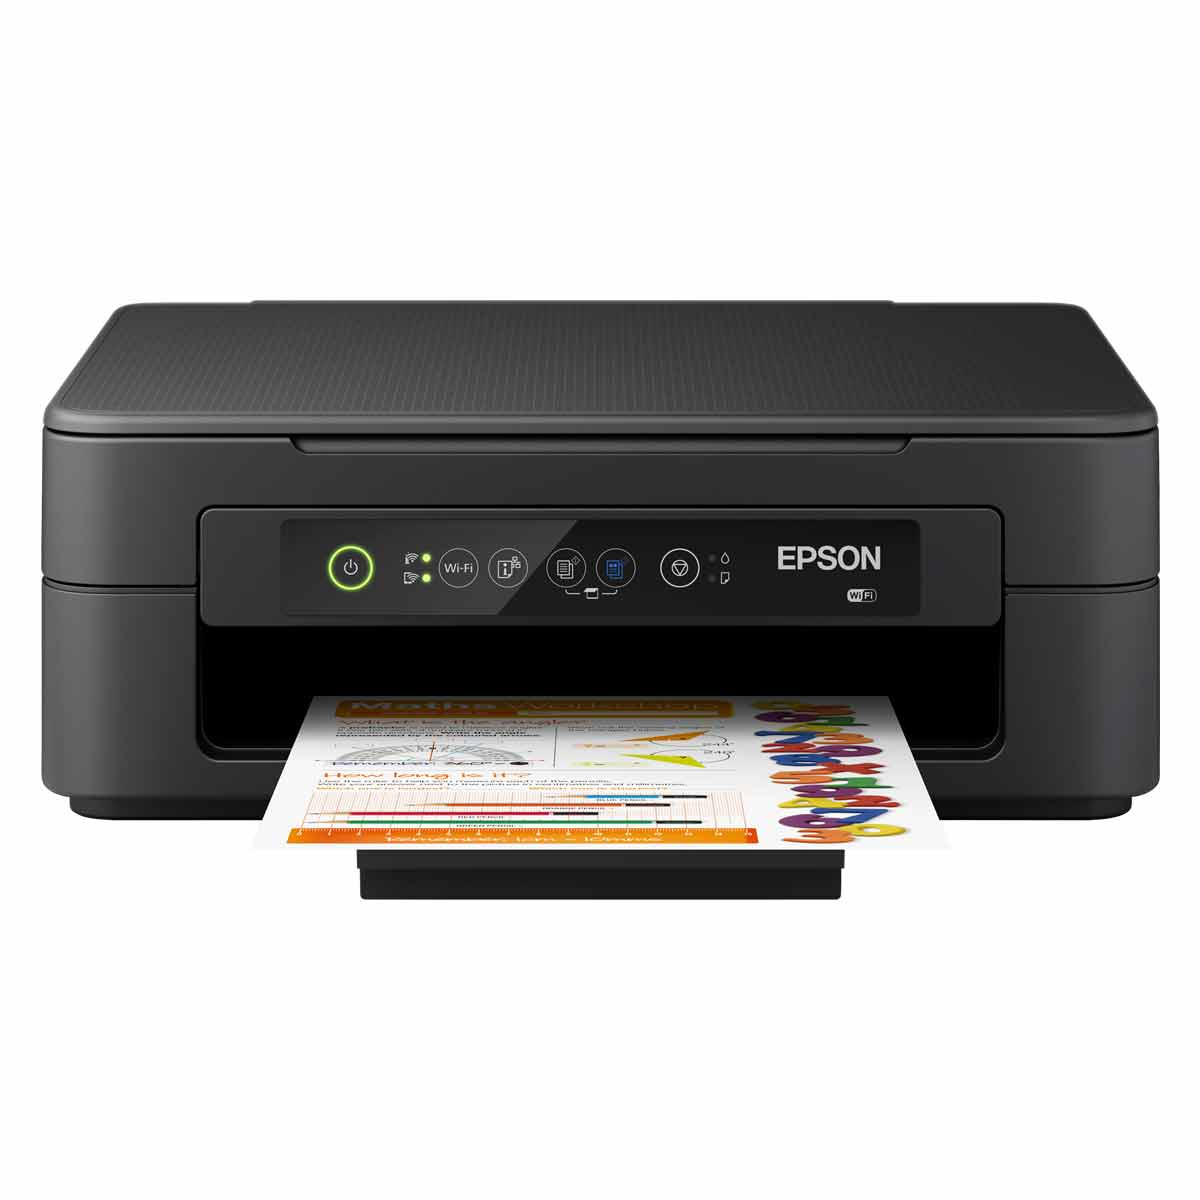 Epson Expression Home XP-2100 Printer & 12 Month Ready Print Subscription Bundle - Black